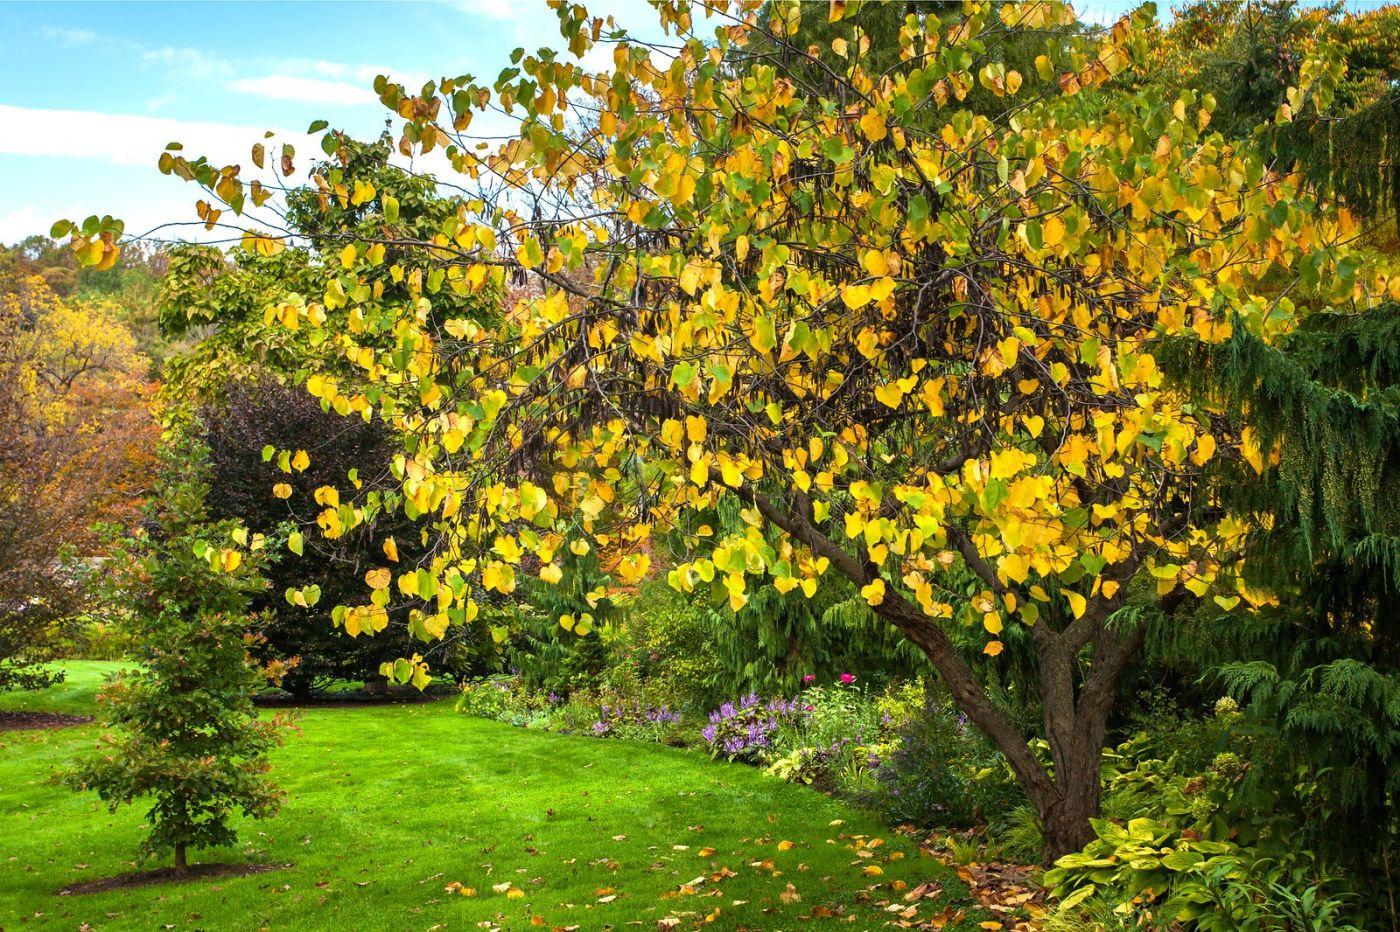 Chanticleer花园,季季有色彩_图1-26